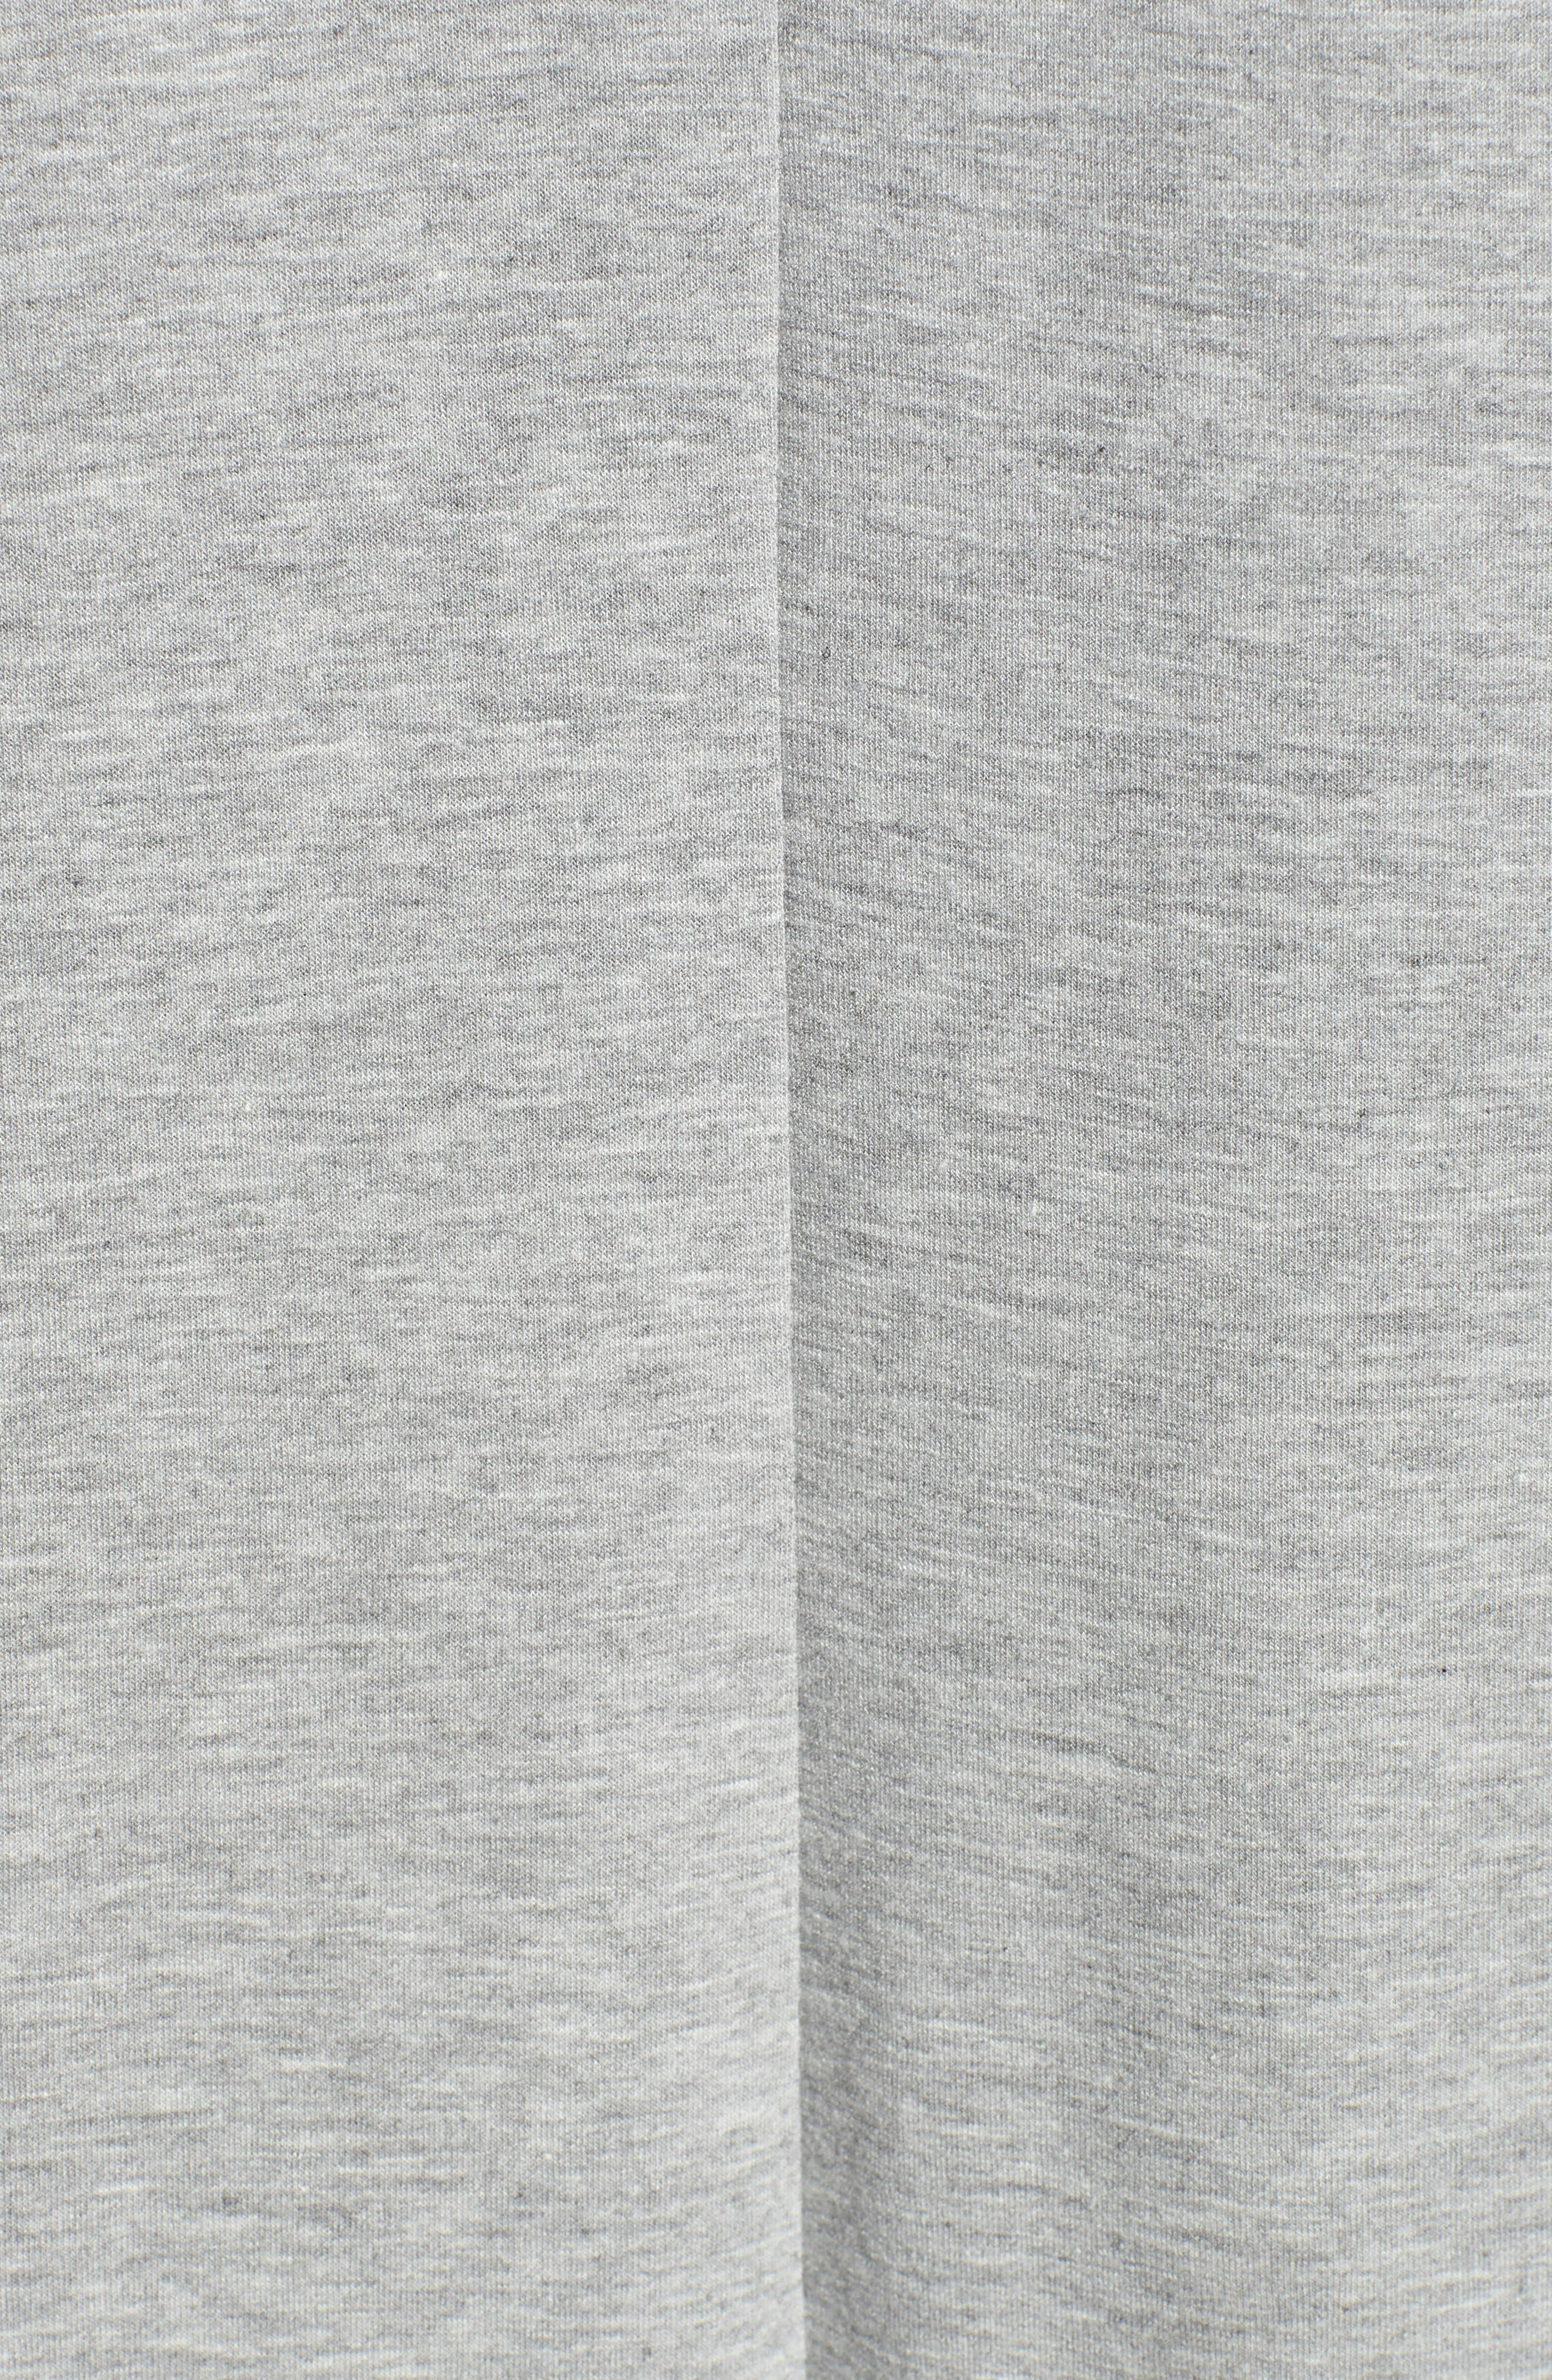 Off-Duty Knit Maxi Dress,                             Alternate thumbnail 6, color,                             030